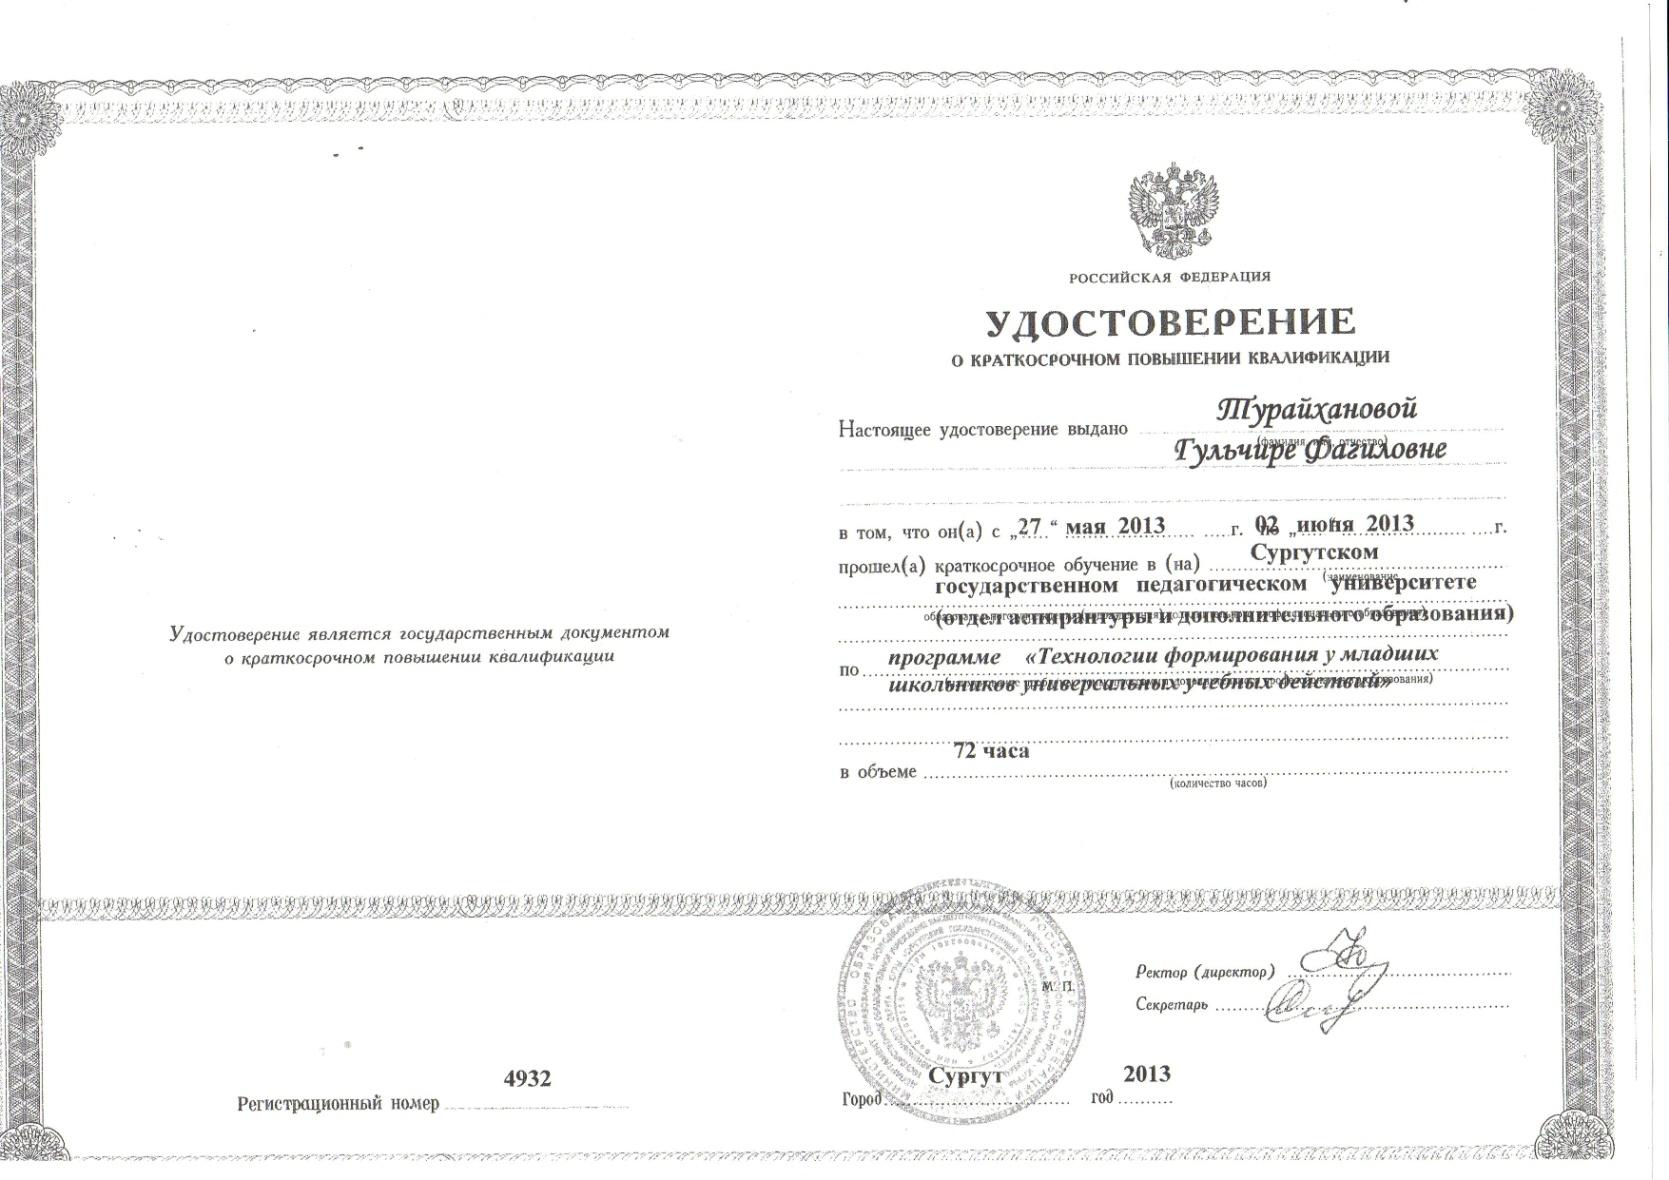 C:\Users\Home\Desktop\грамоты с 2012 года Турайханова Г.Ф\img370.jpg